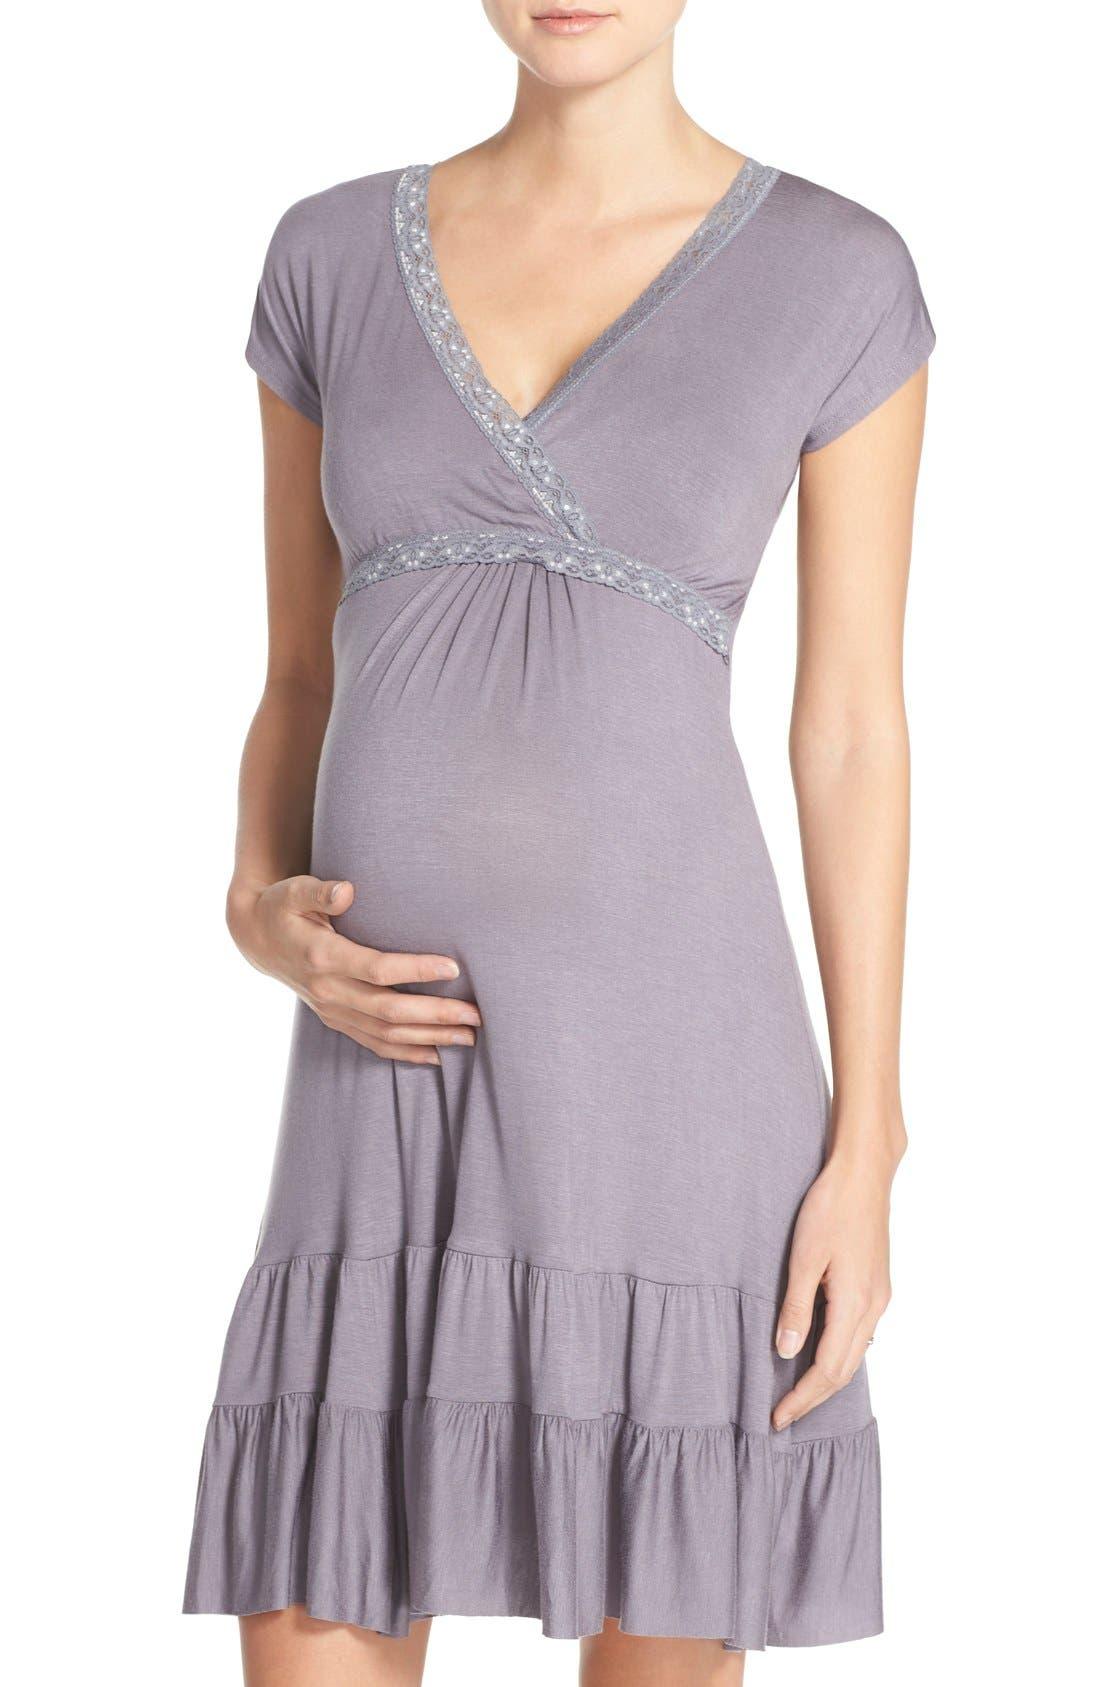 Alternate Image 1 Selected - Belabumbum Ruffle Nursing Dress